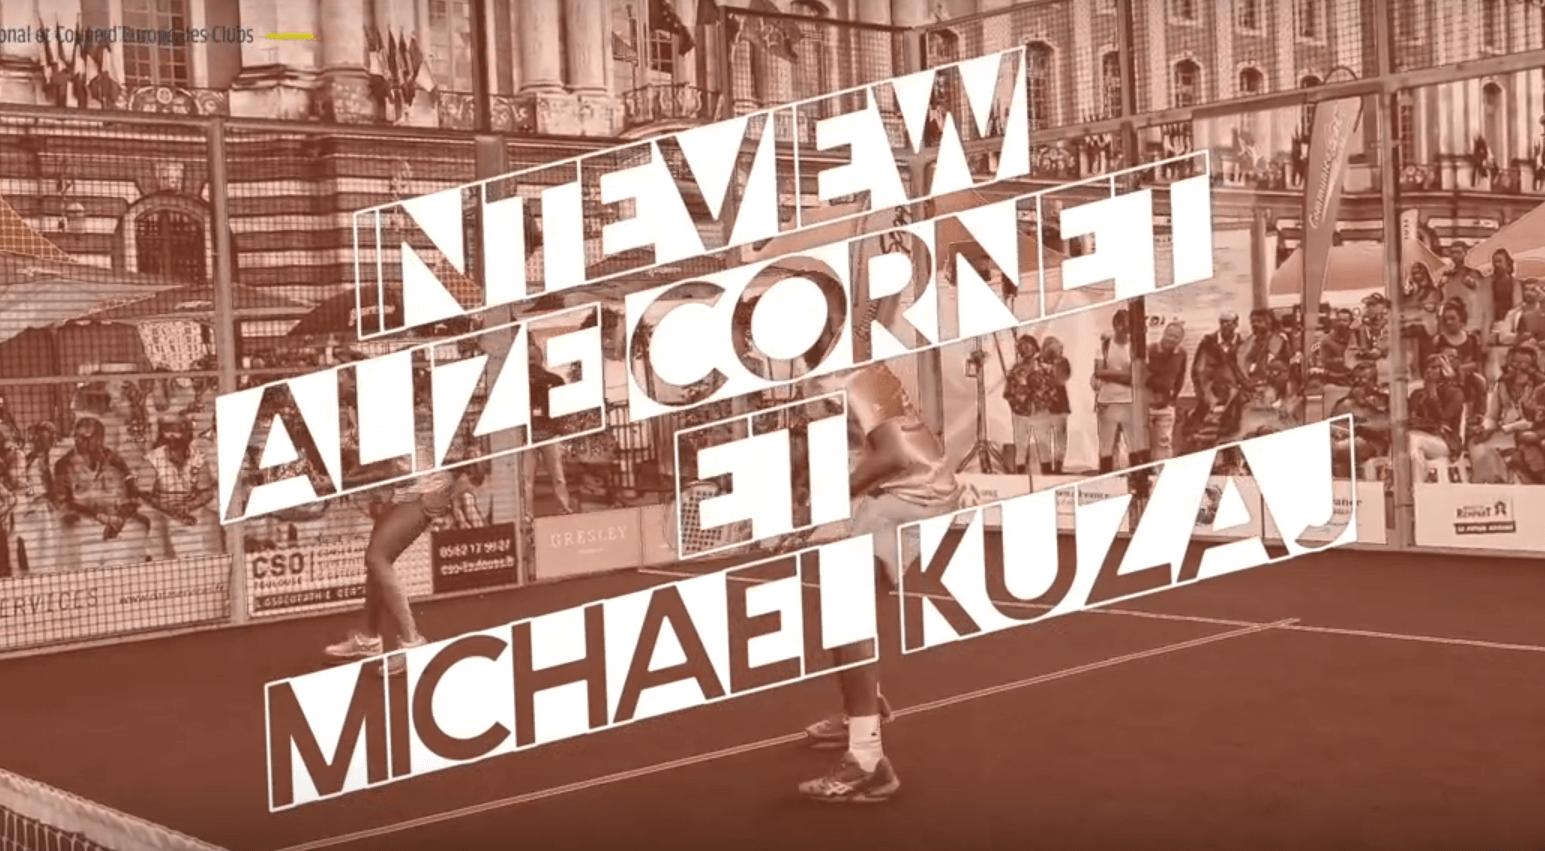 Cornet / Kuzaj:「混合トーナメントはいつ承認されますか?」